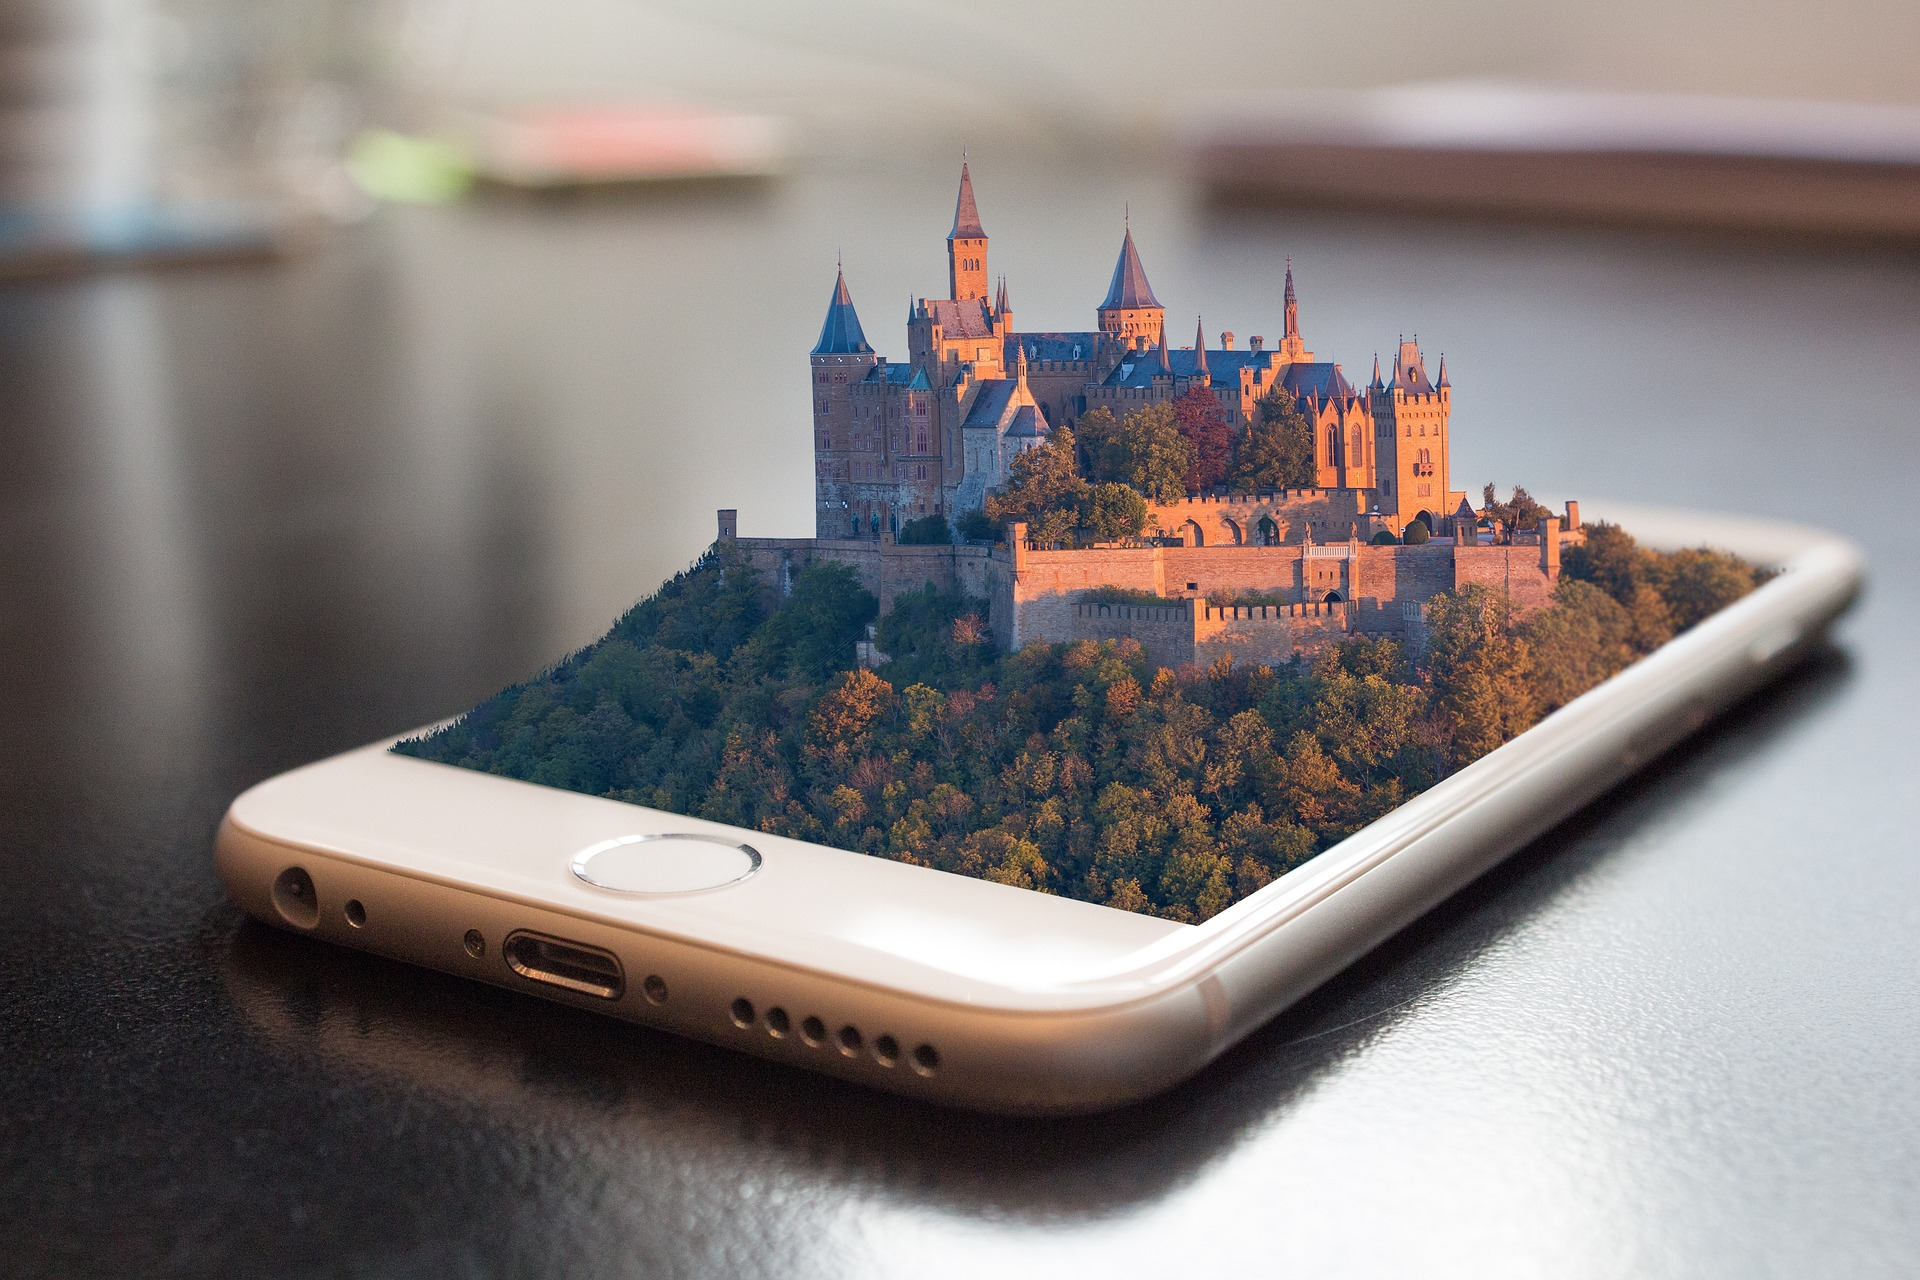 mobile app android ios δημιουργία φτιάξιμο